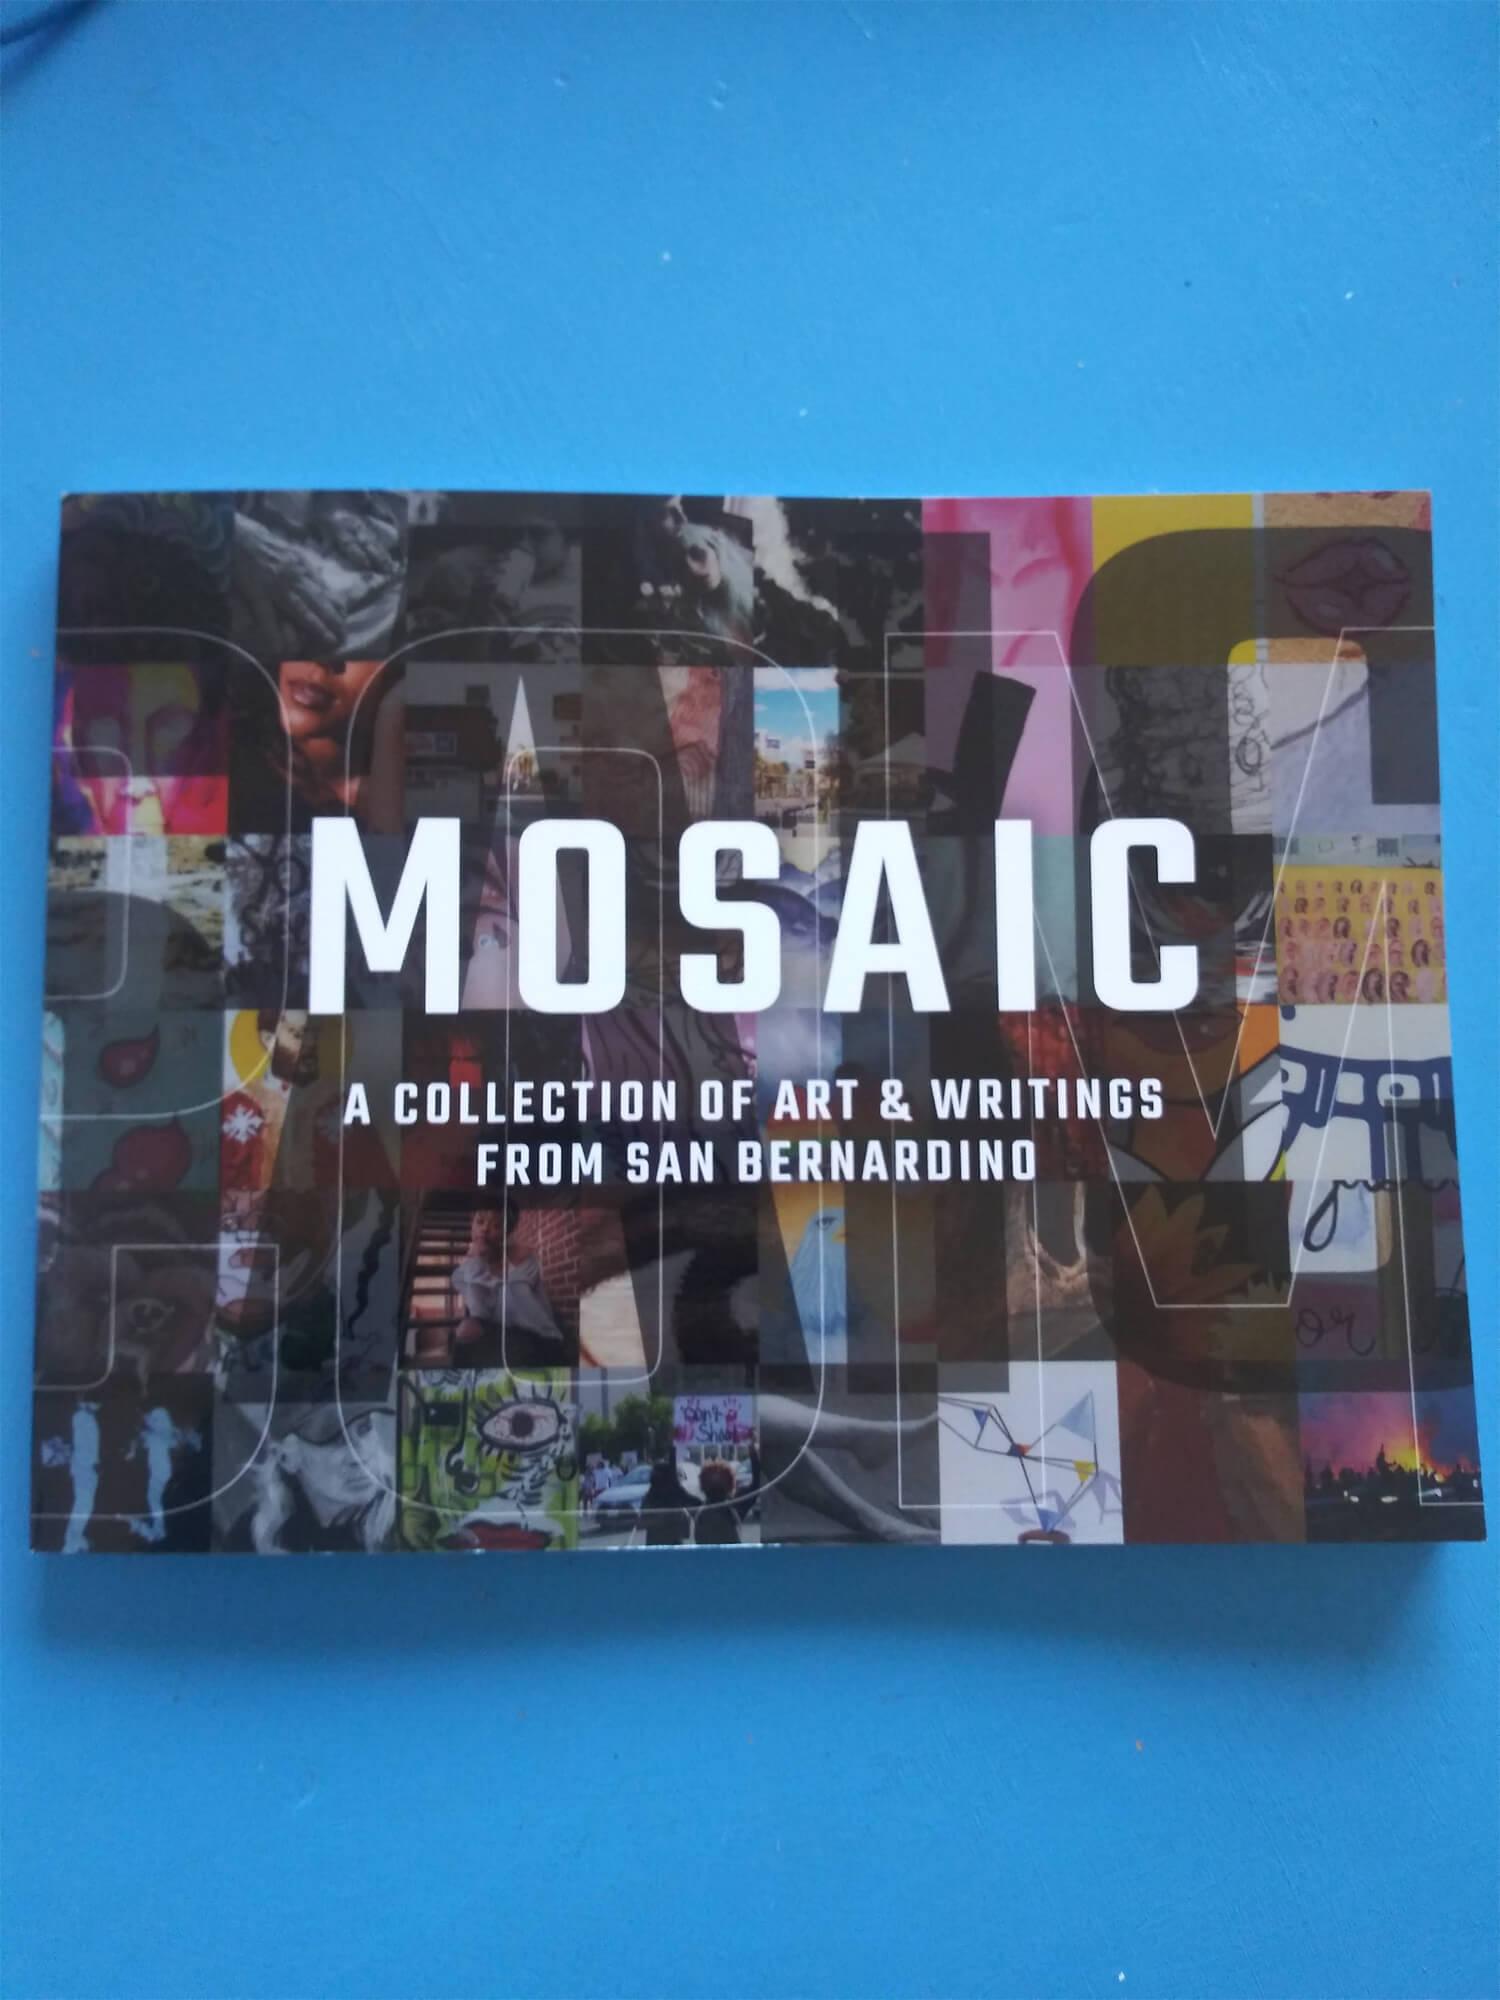 Mosaic A Collection of Art & Writings From San Bernardino